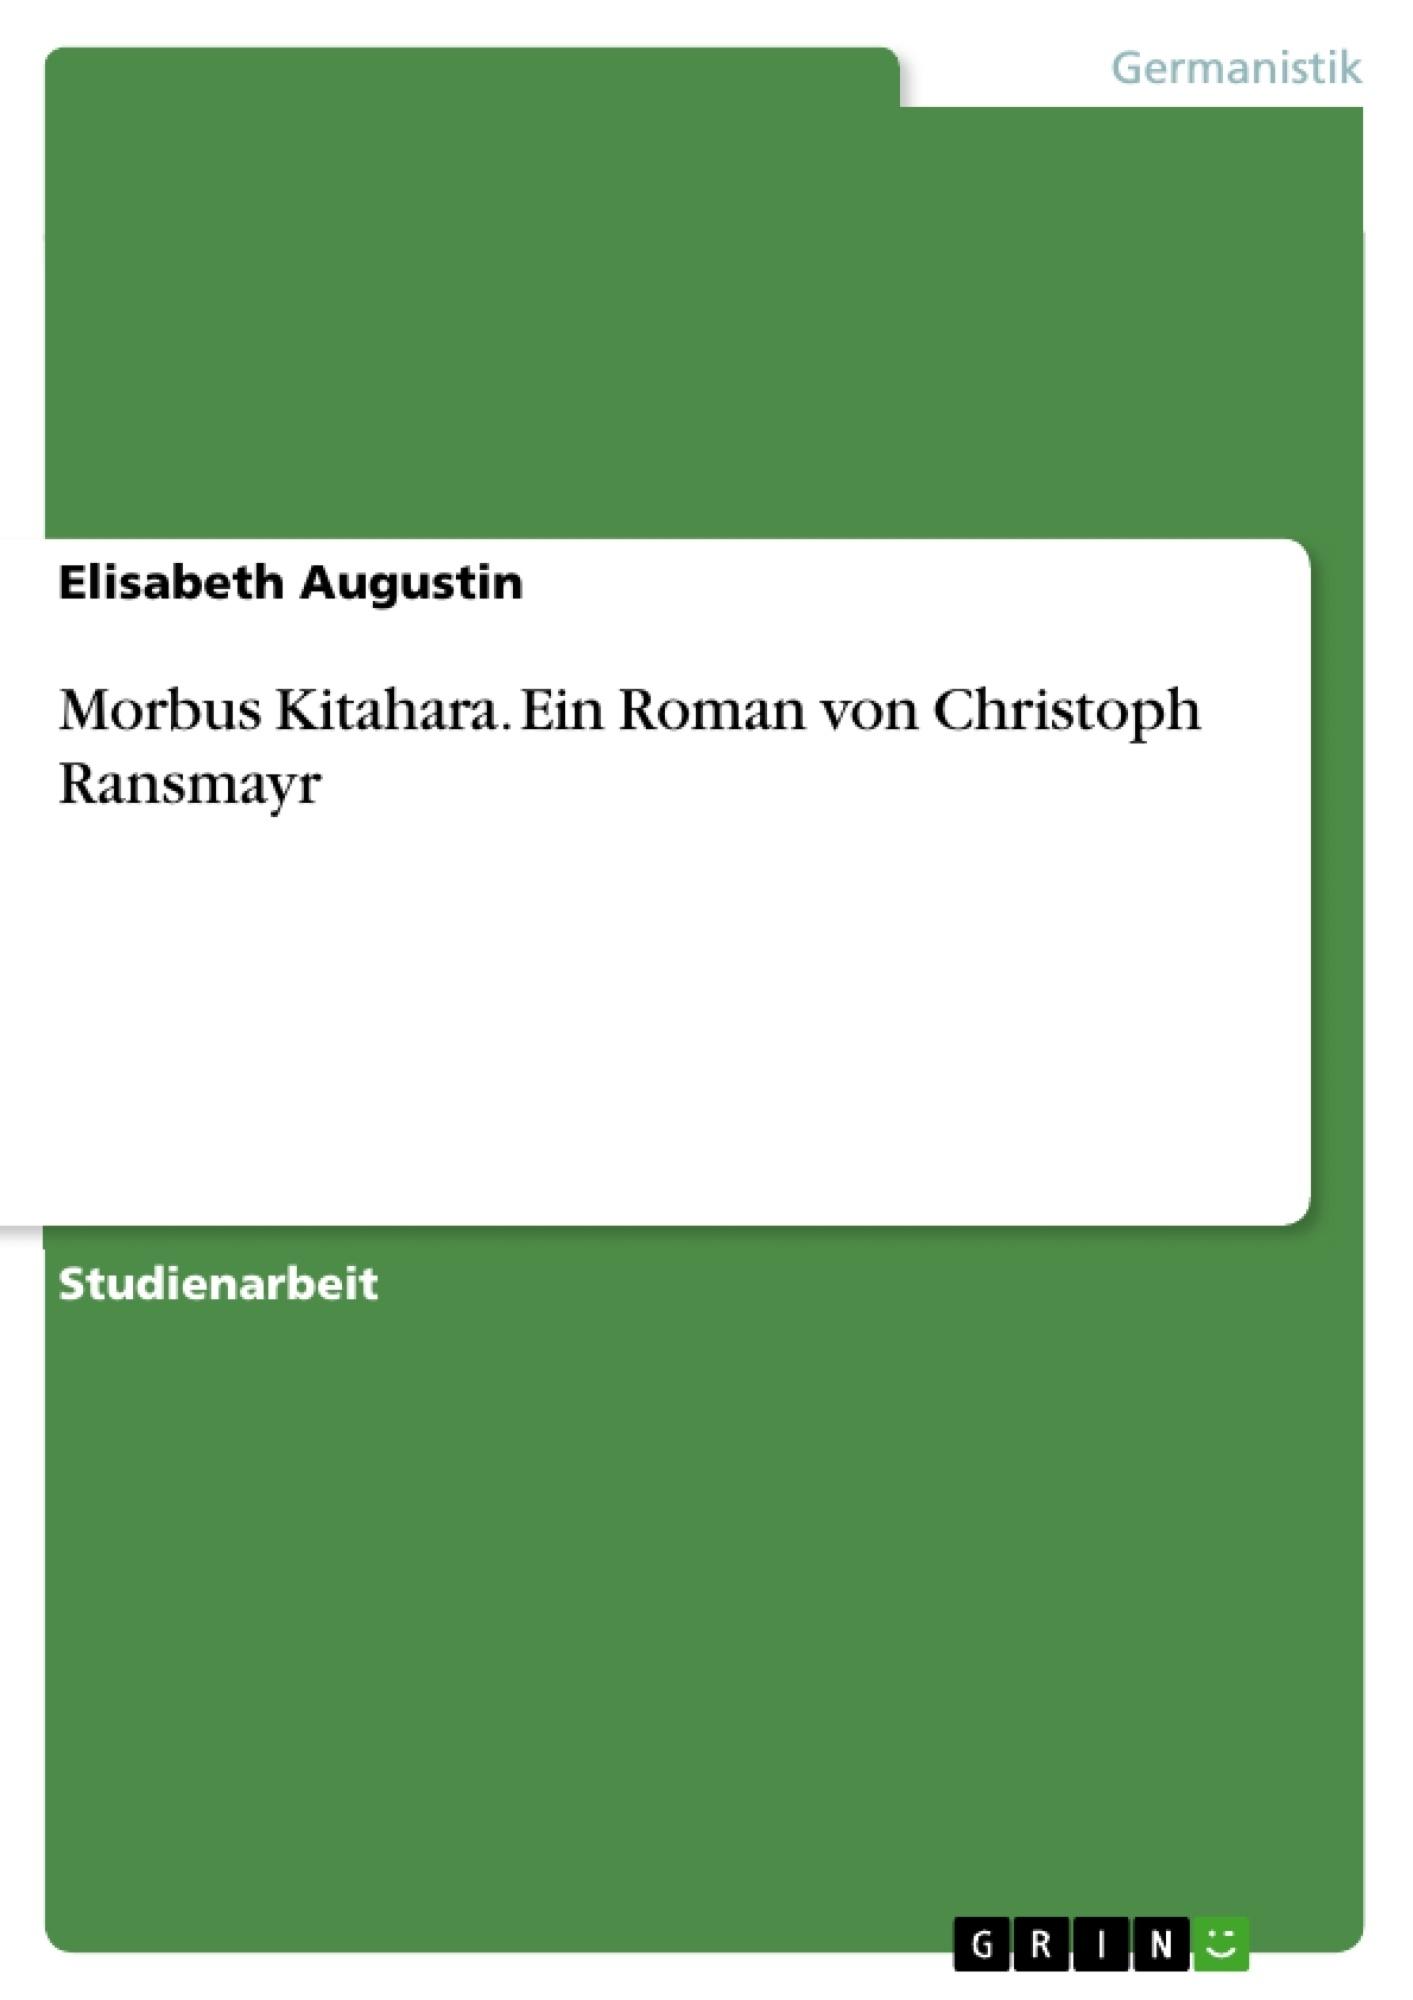 Titel: Morbus Kitahara. Ein Roman von Christoph Ransmayr